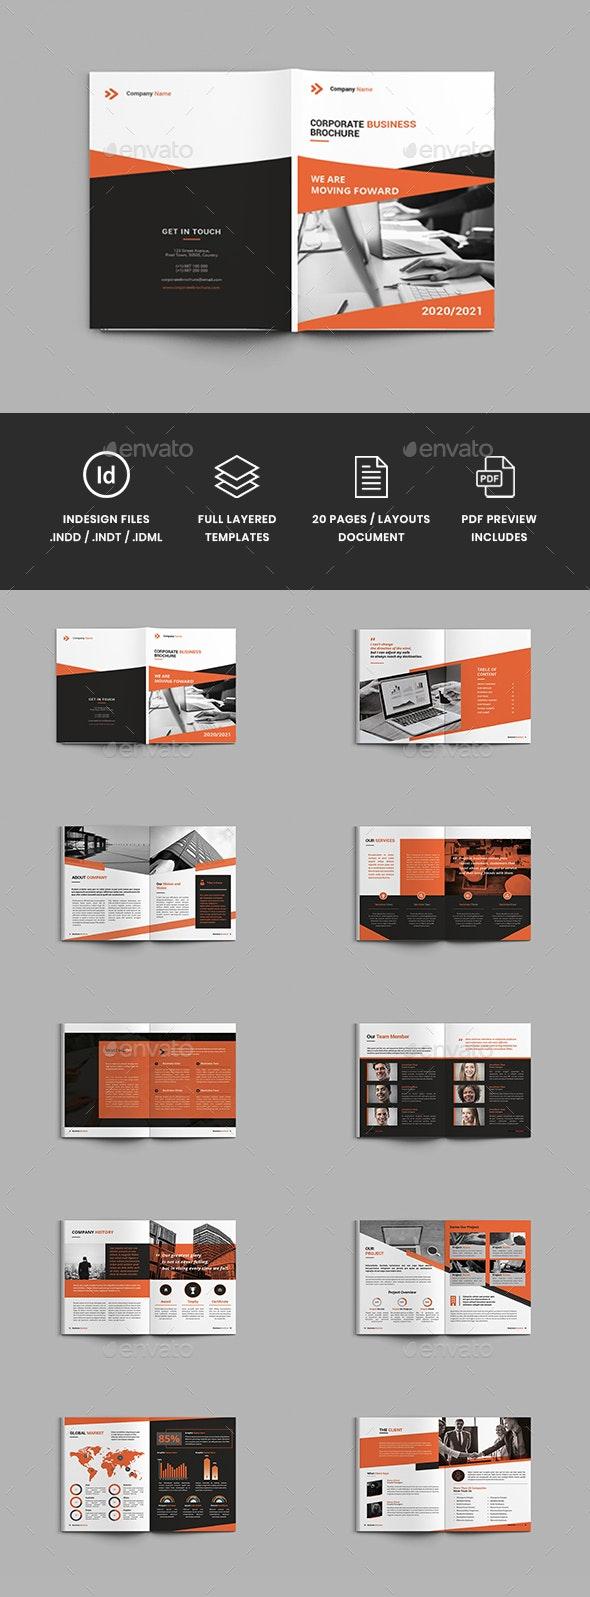 Companion - A4 Business Brochure Template - Corporate Brochures